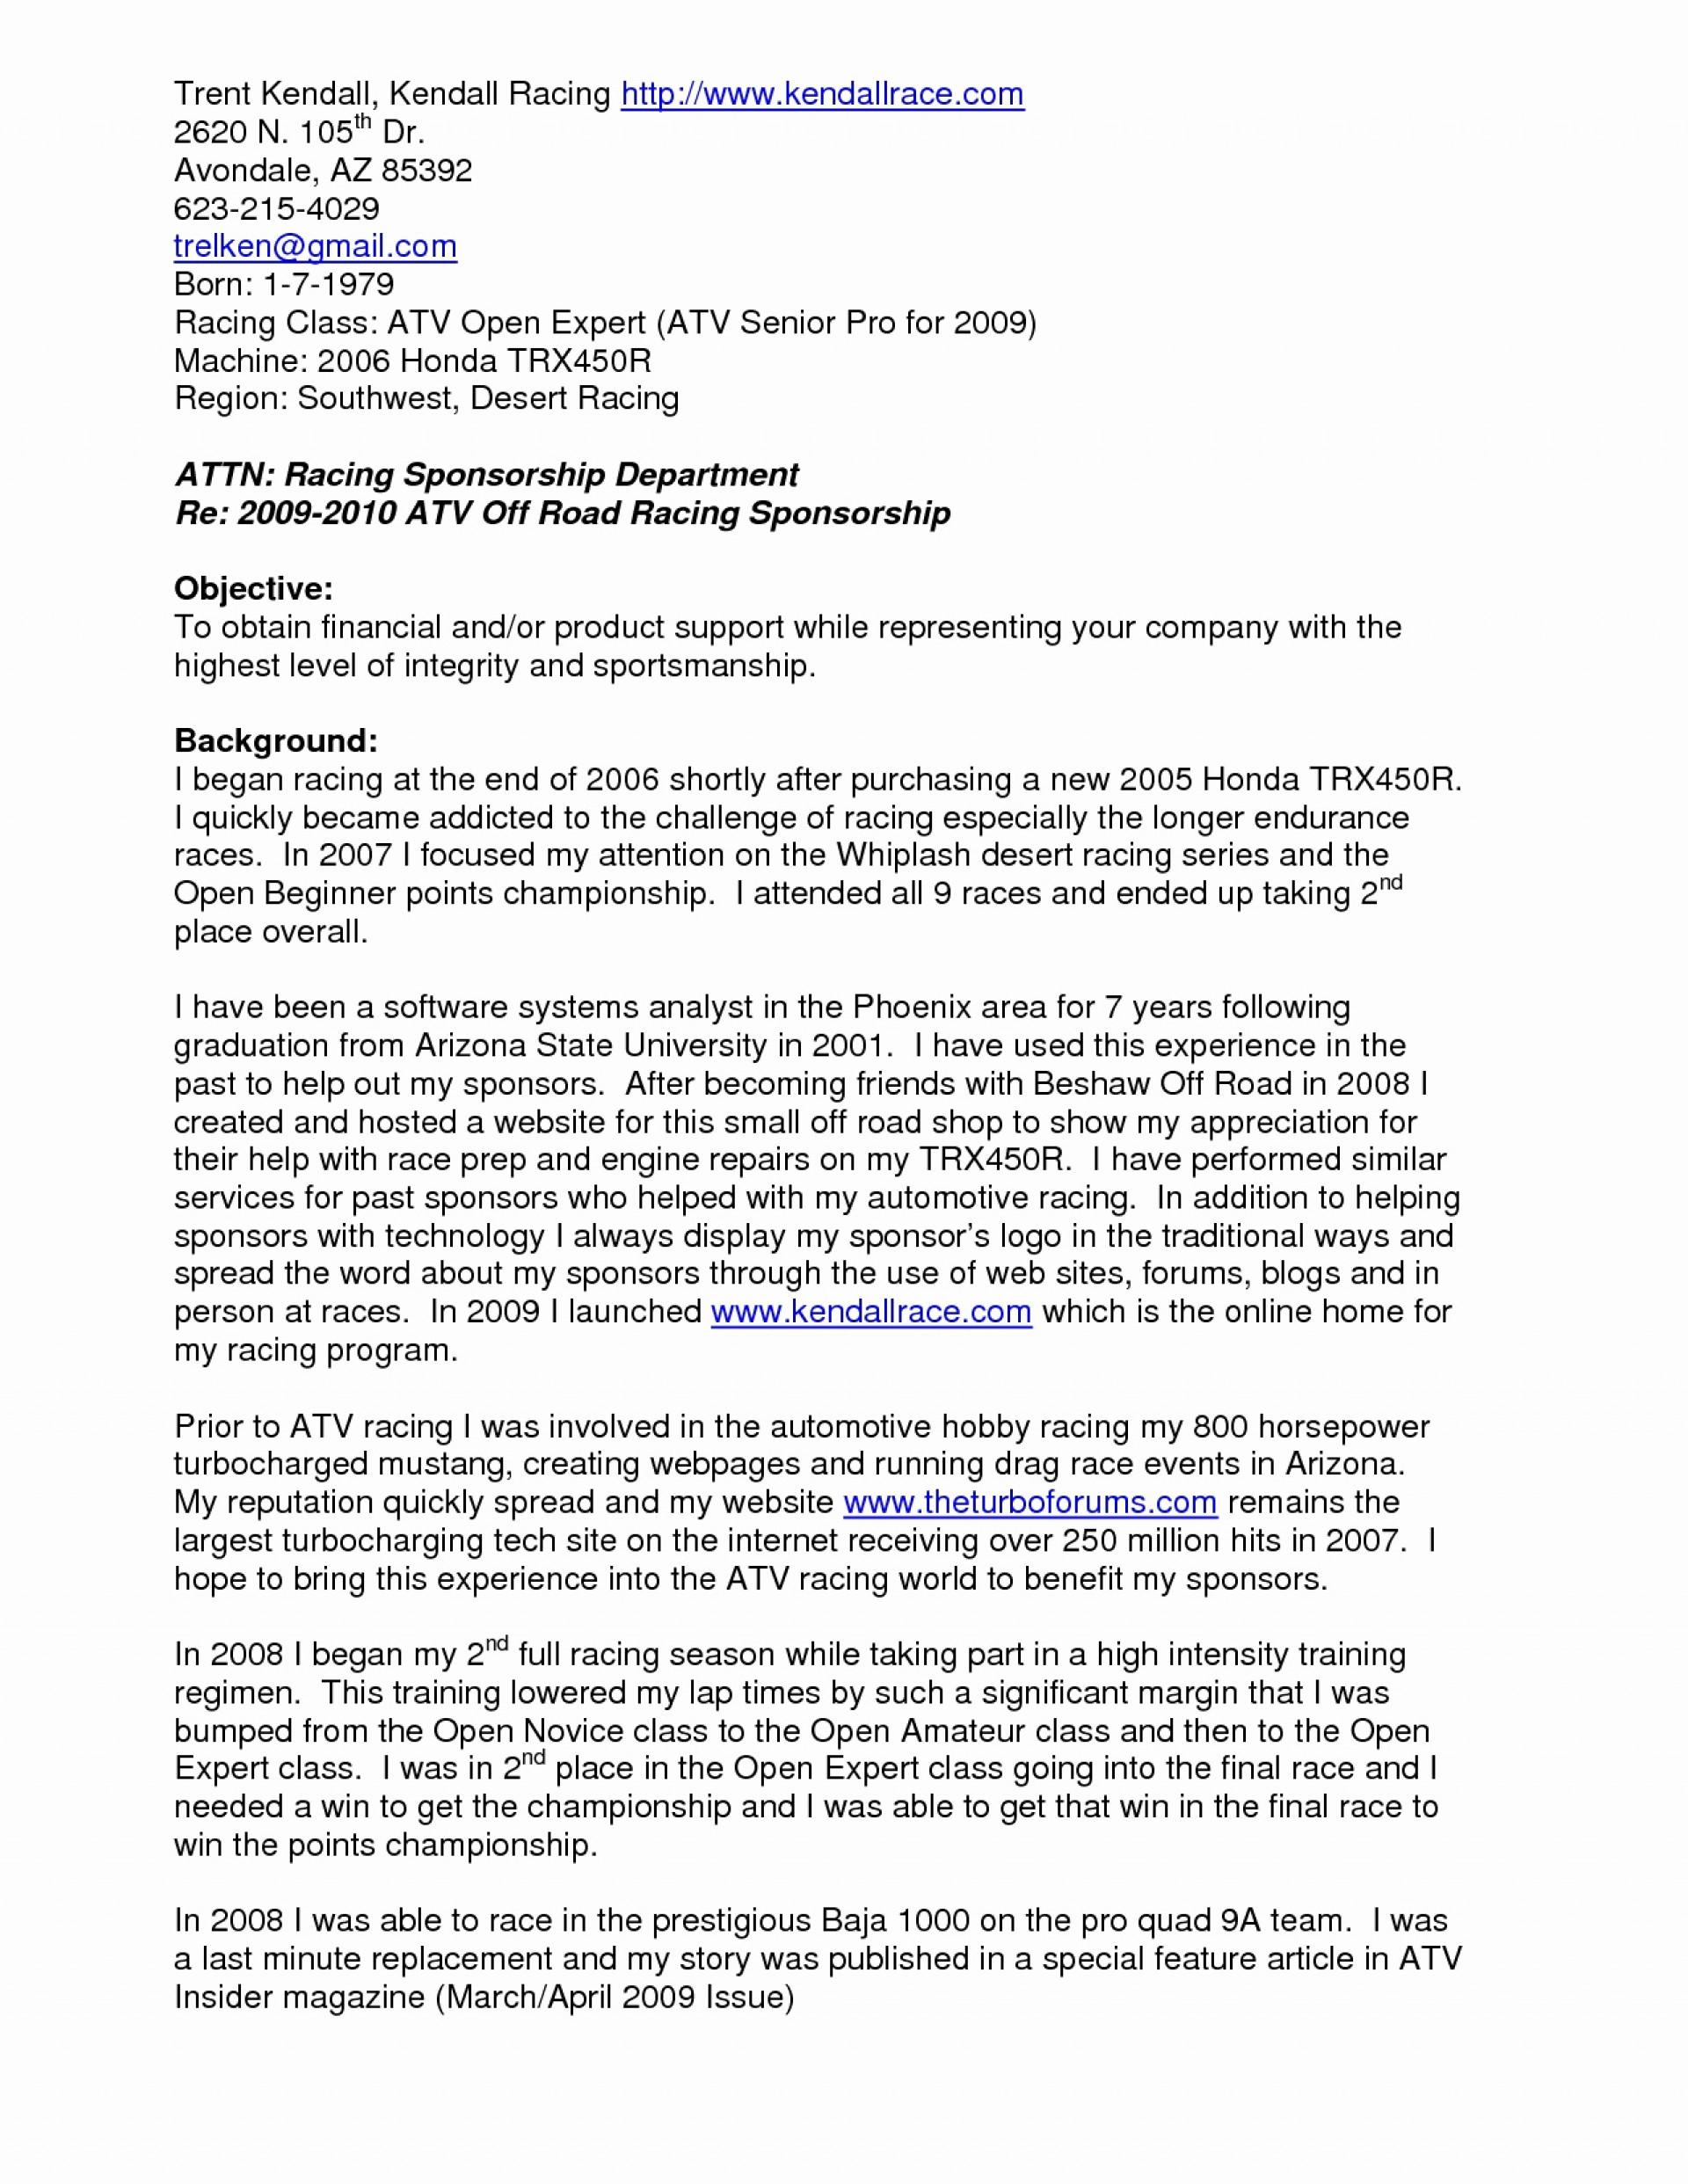 010 Background Proposal Sponsorship Best Of Essay Writing Sites Uk Top Companies Websites 1920